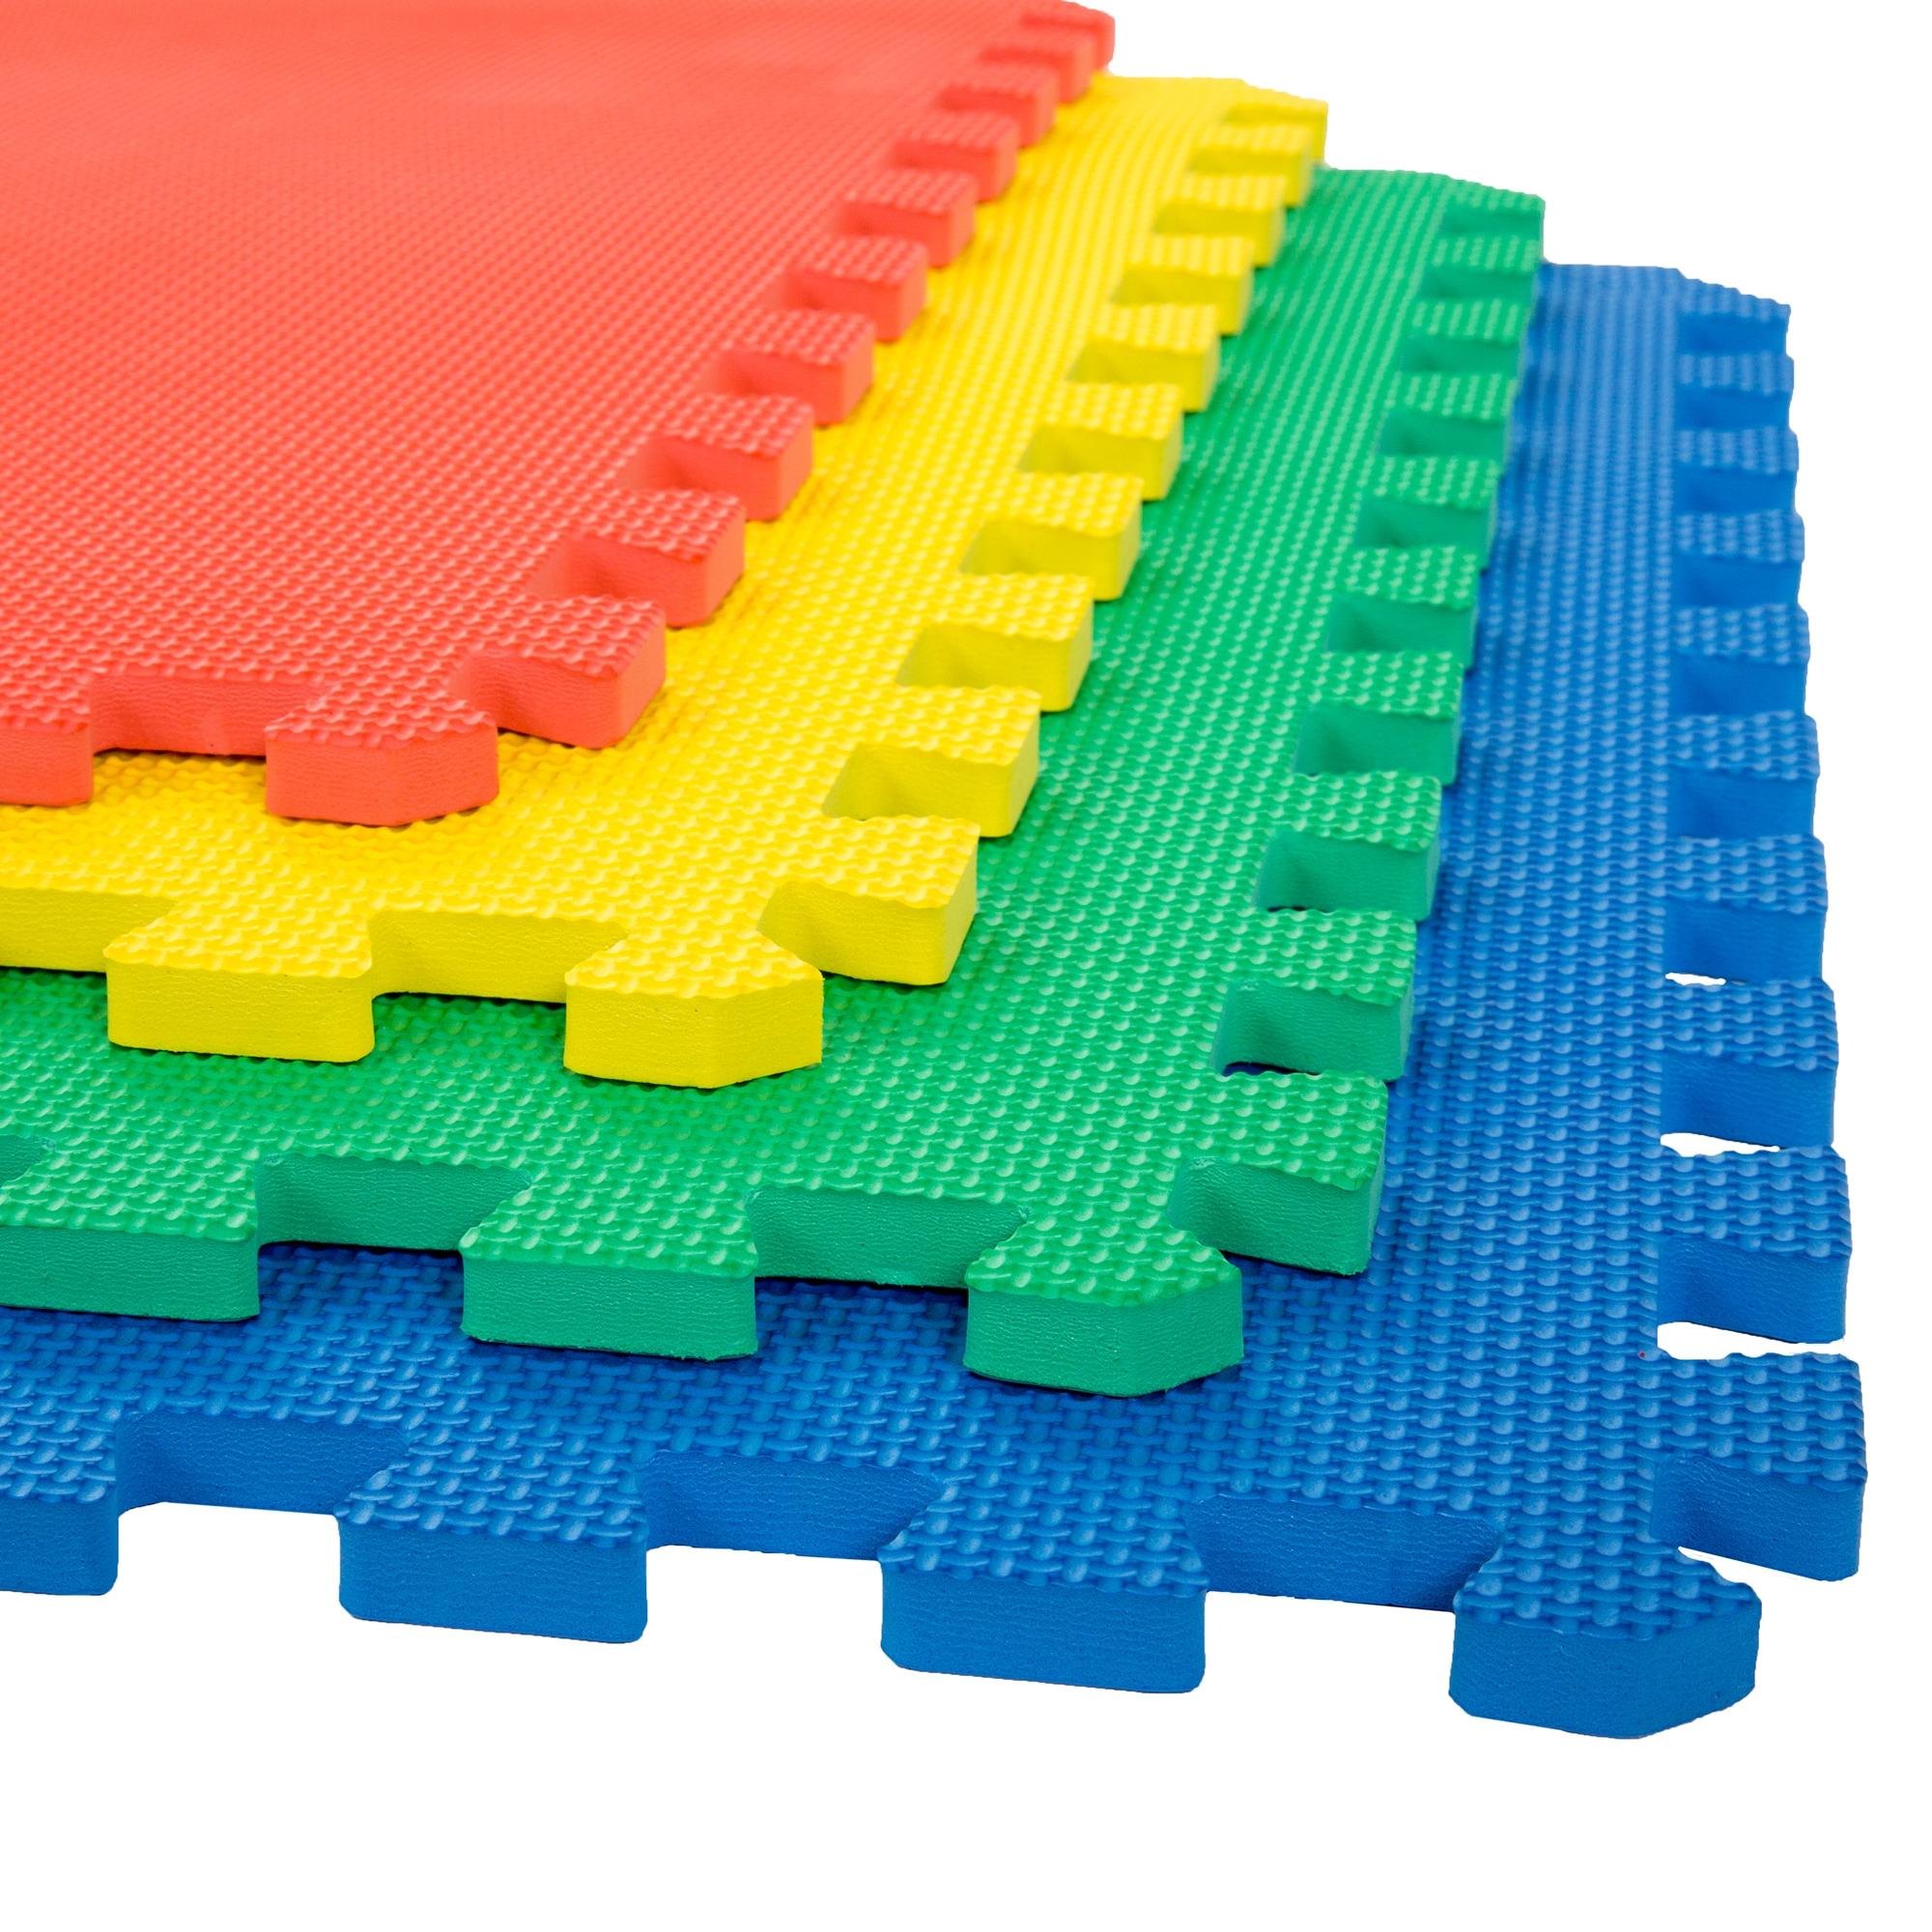 foam sports barbell interlocking x amazon cap mats dp mat outdoors floor com piece puzzle